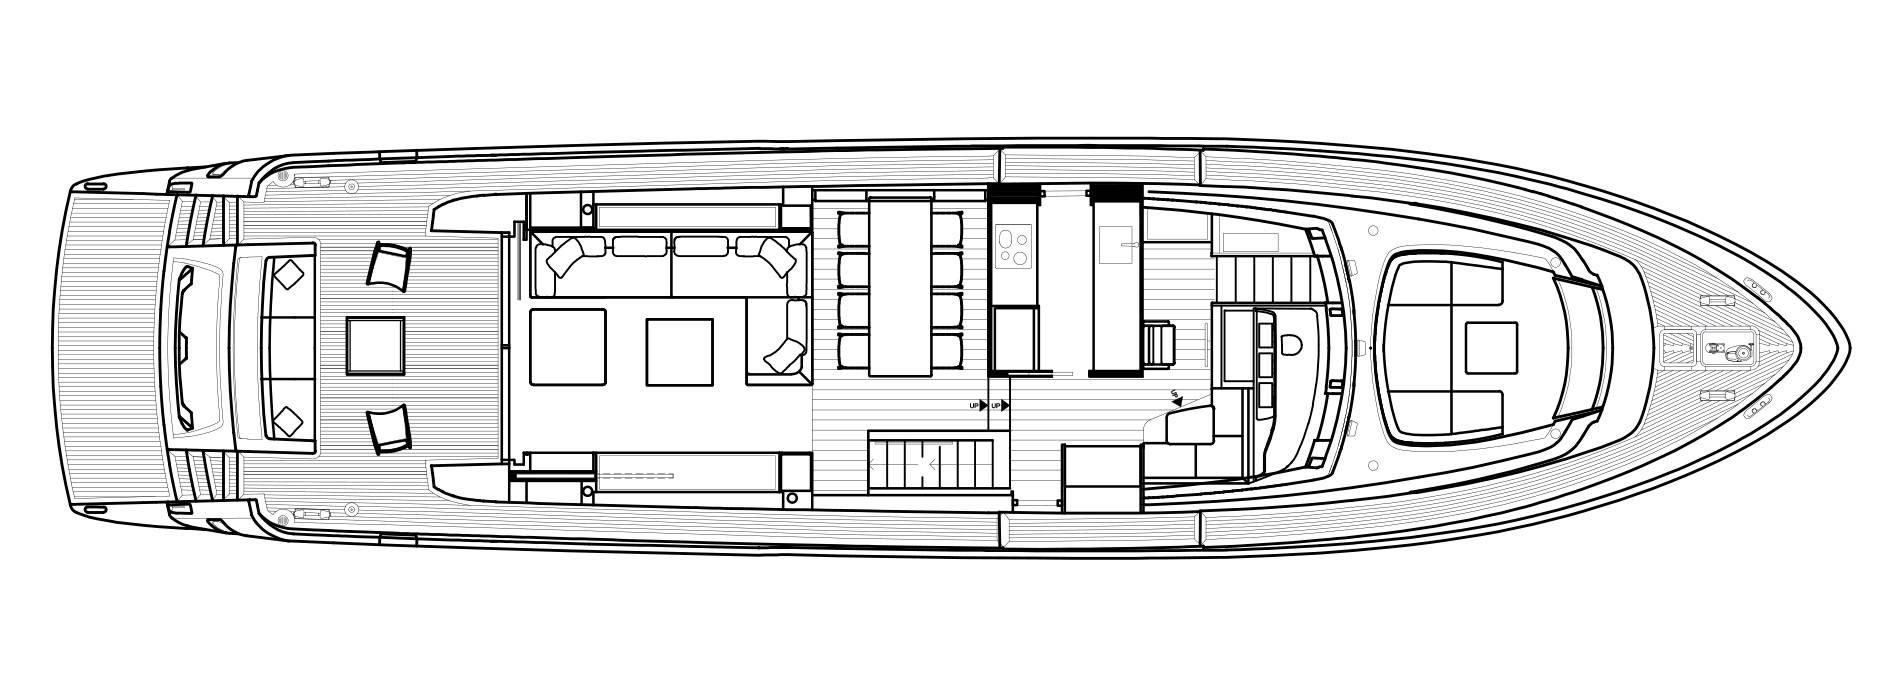 Sanlorenzo Yachts SL78 主甲板